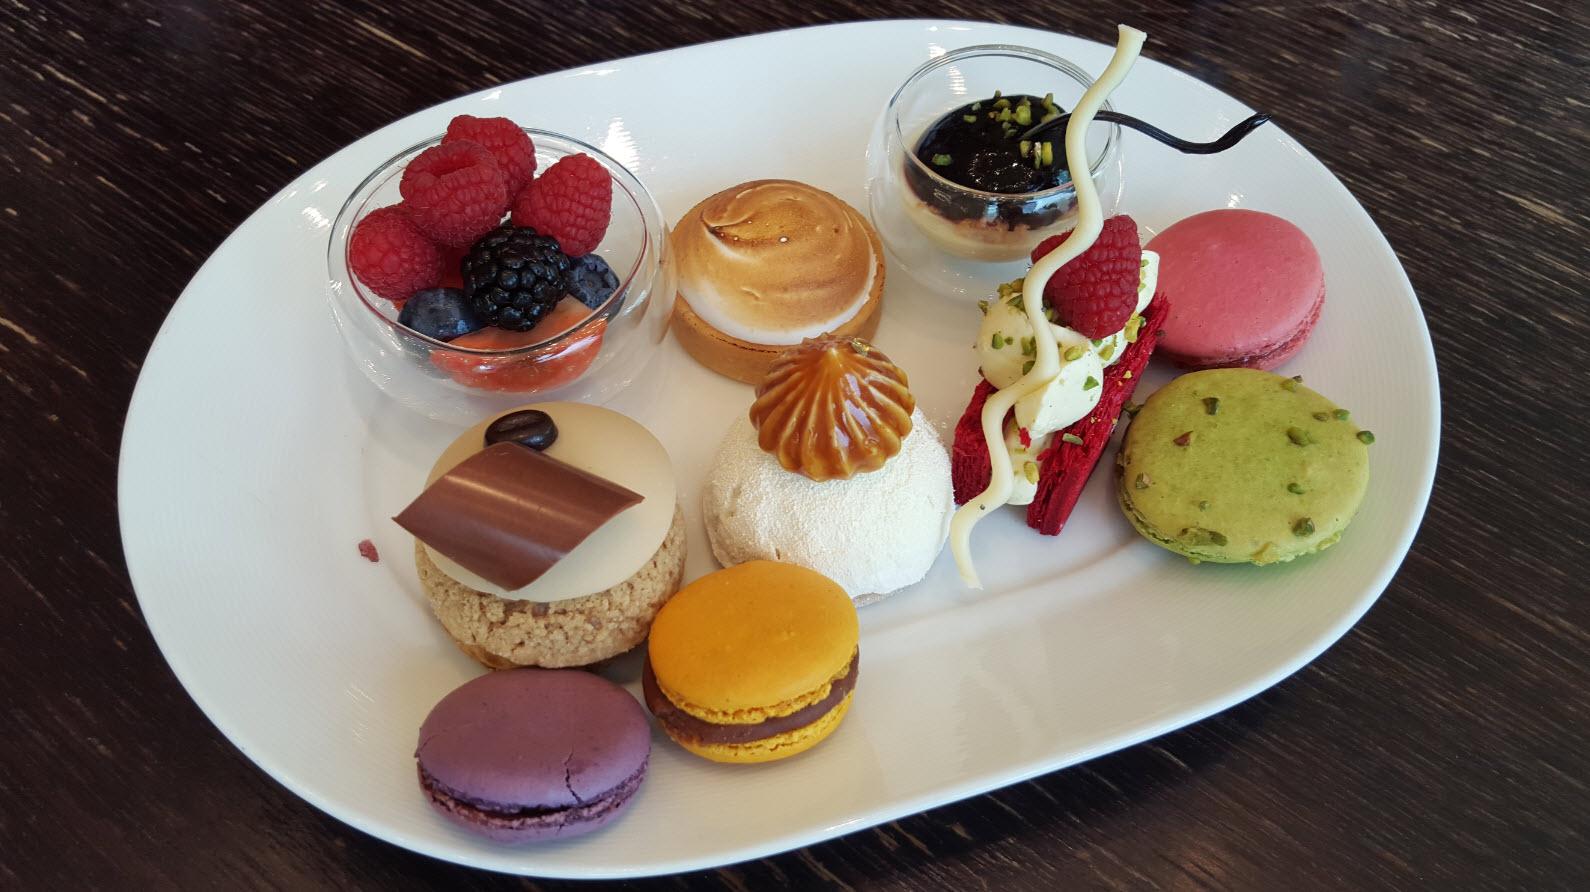 Belle assiette desserts